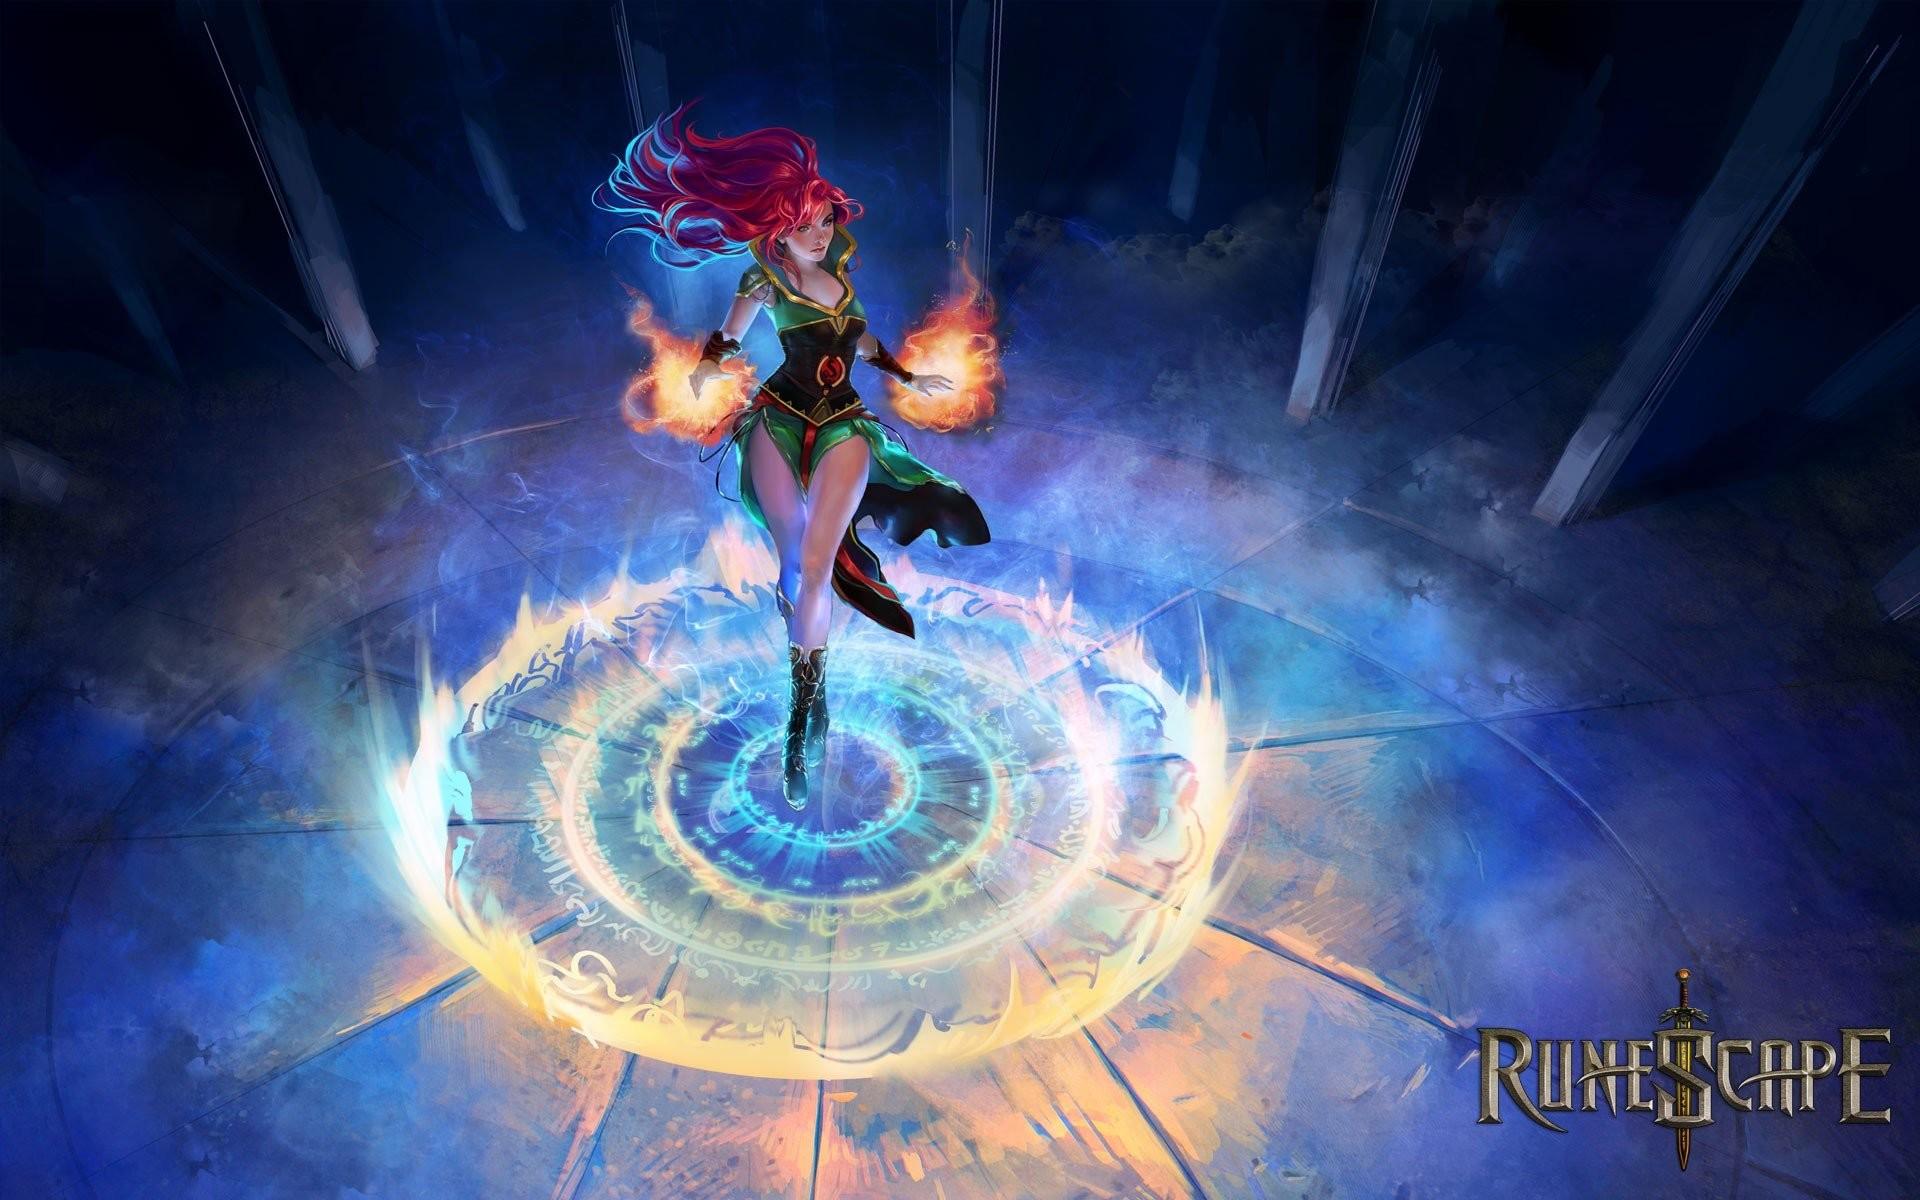 women flames mage video games blue red text fire redheads RPG video magic  MMORPG pillars RuneScape